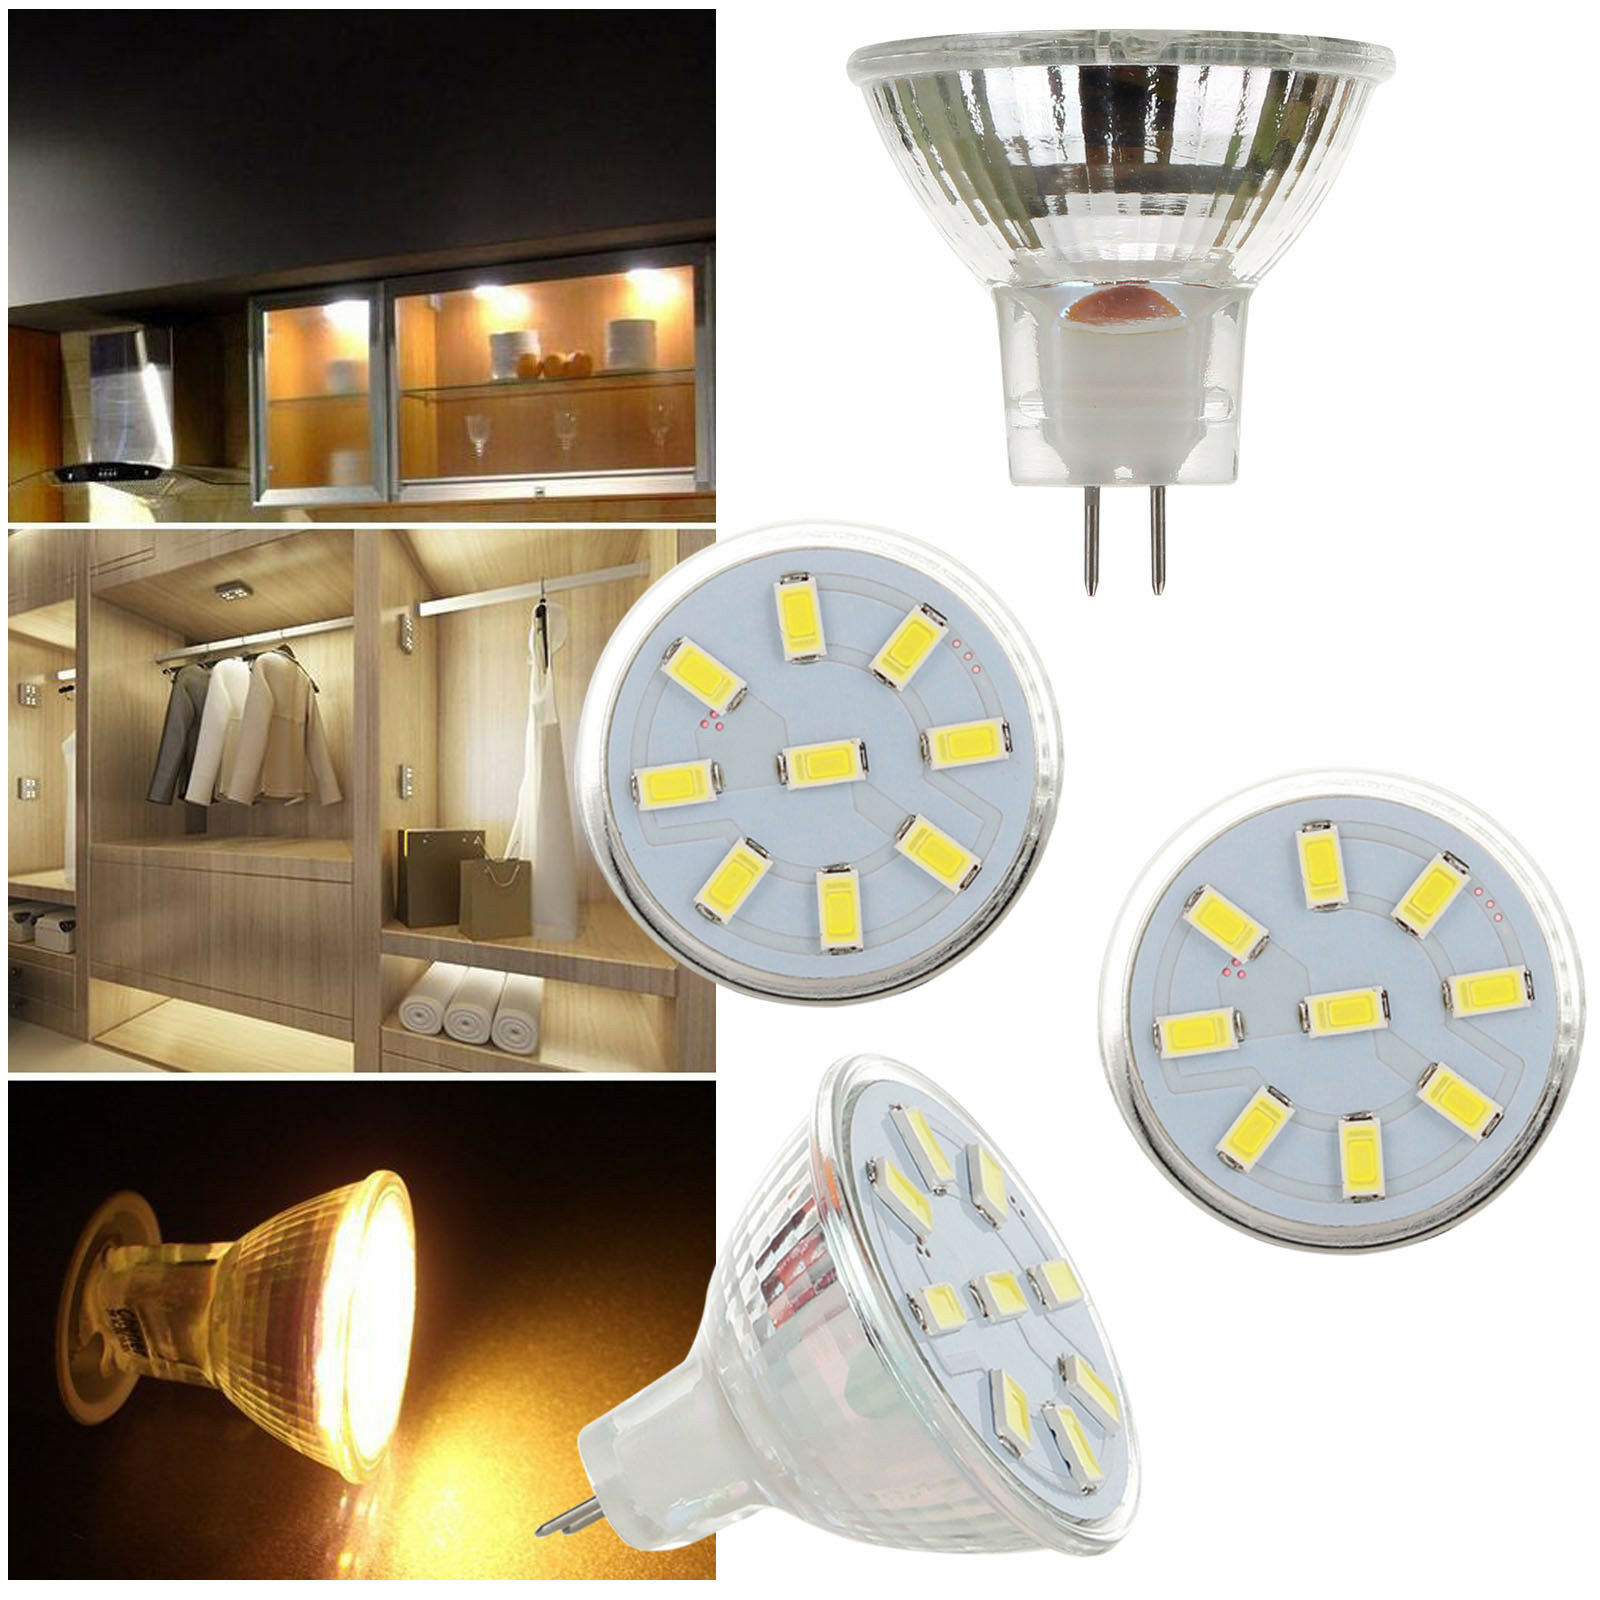 MR11 LED Bulb Spotlight 2W 3W 4W 12-24V 5733 2835 SMD 10W 20W Equivalent Lamp Lampada 35mm Led Spot Light Home Lighting Lamps